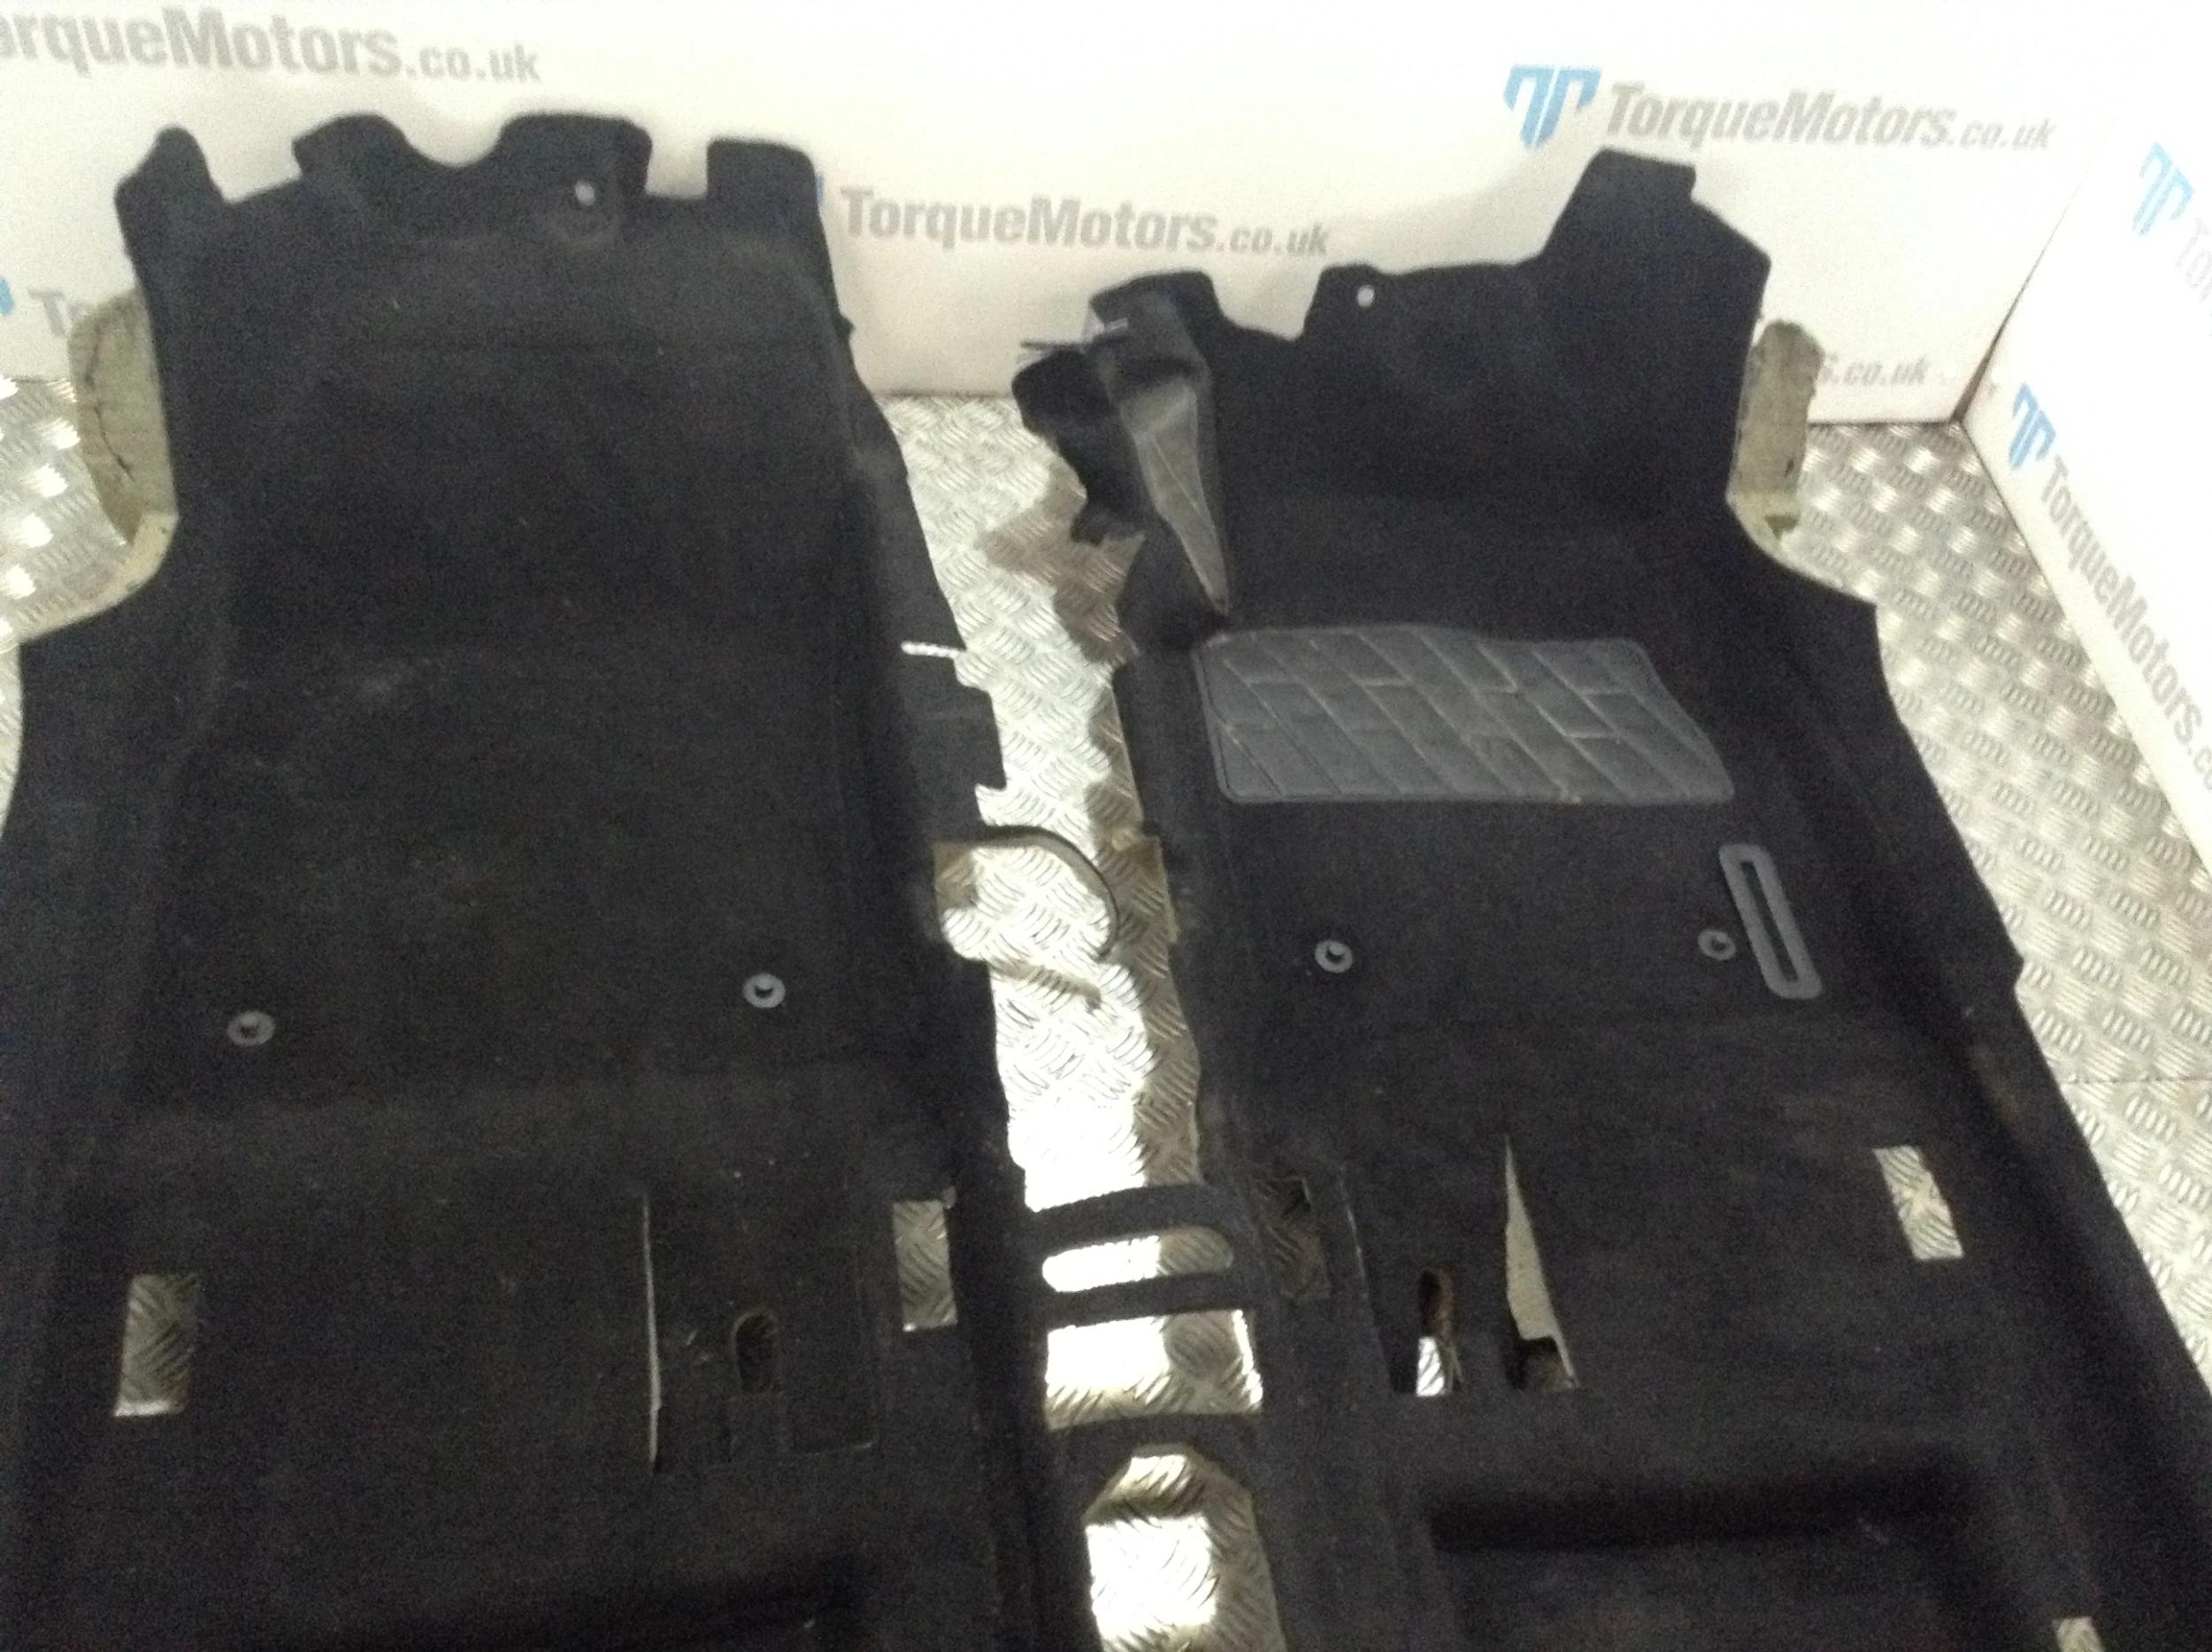 BLACK /& STITCHED EDGES VAUXHALL ASTRA J GTC VELOUR FLOOR CARPET MATS GENUINE